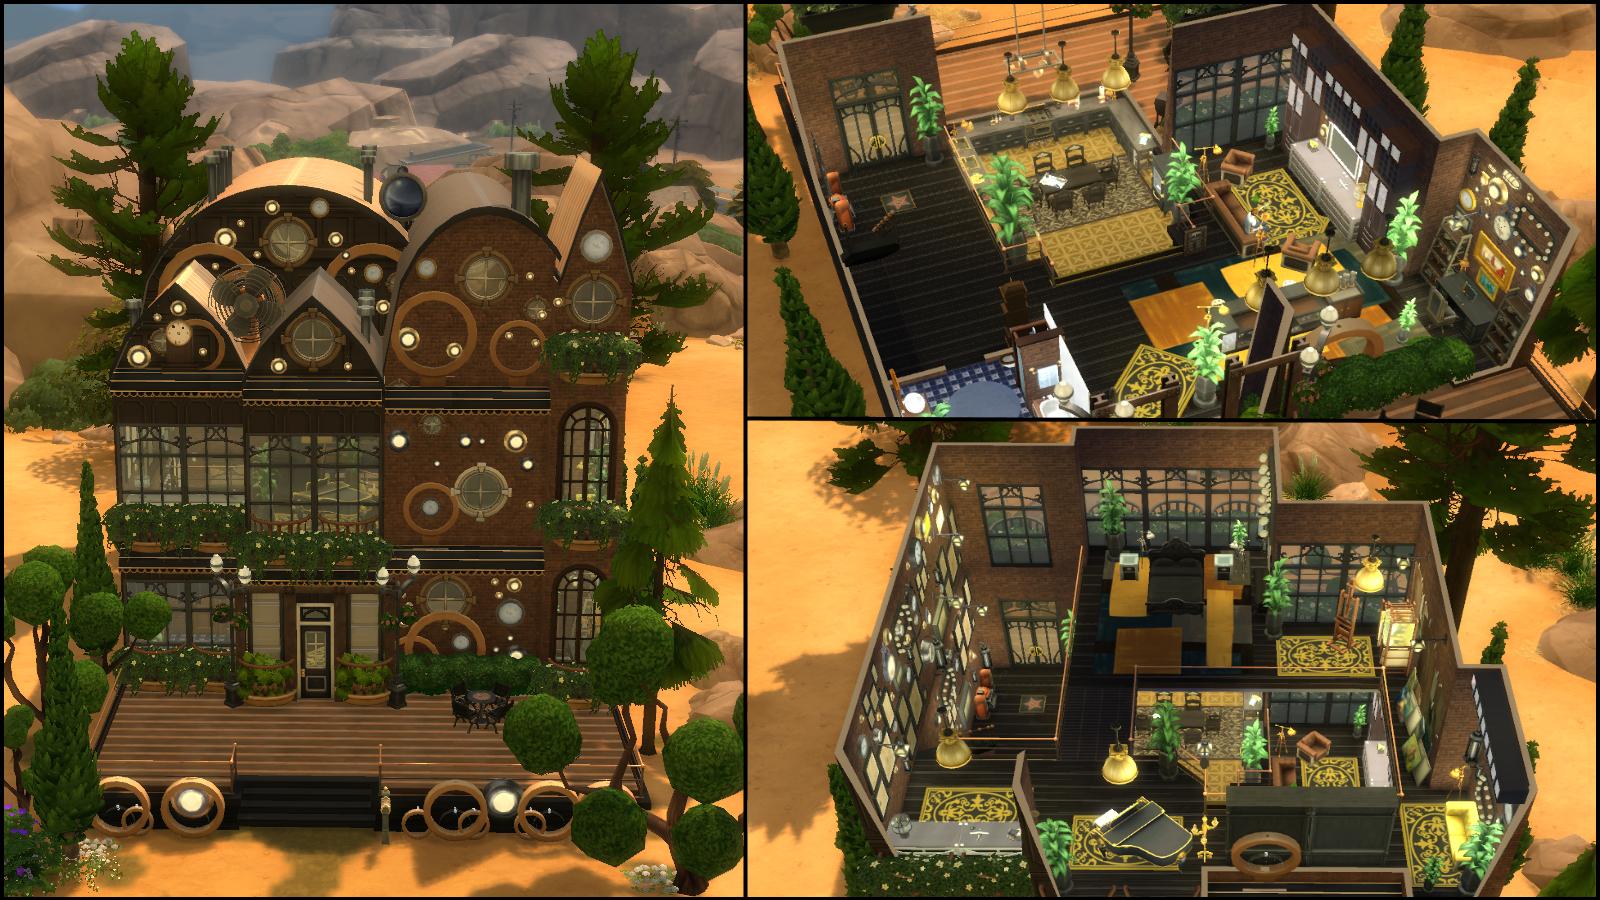 Sims 3 Mansion Floor Plans The Sims 4 Gallery Spotlight Simsvip